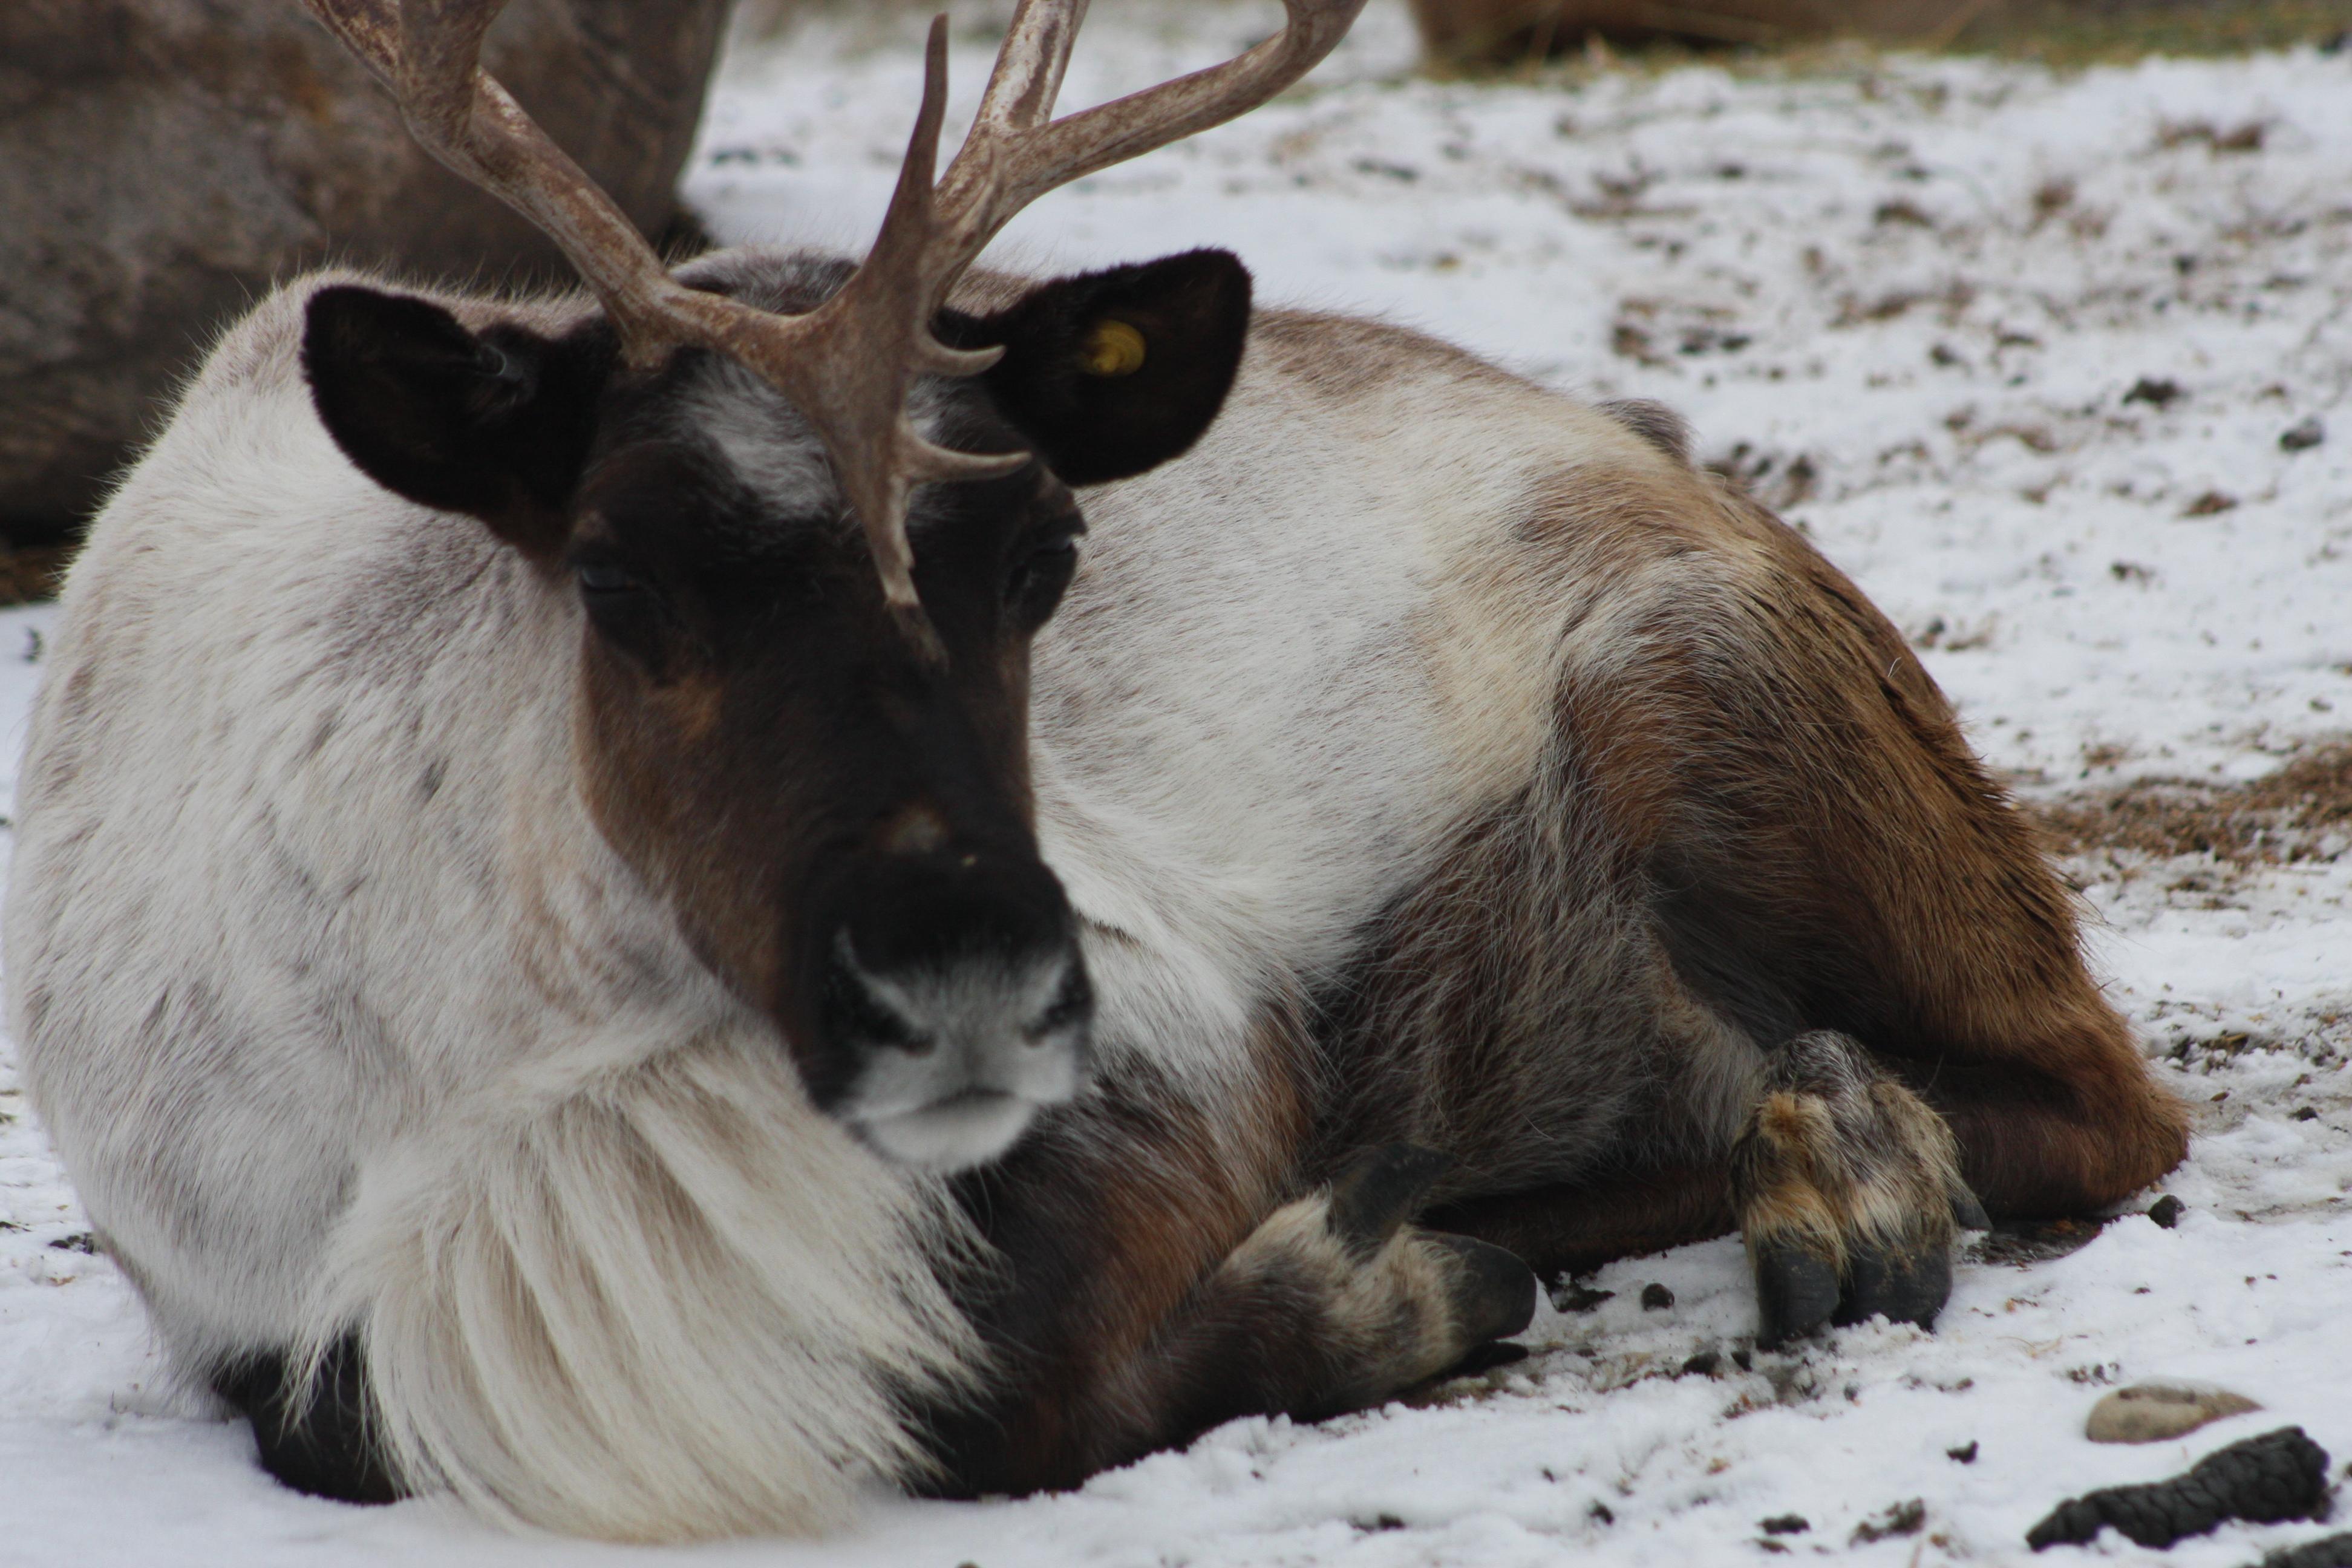 Reindeer - Photo Credit to Amanda Cone